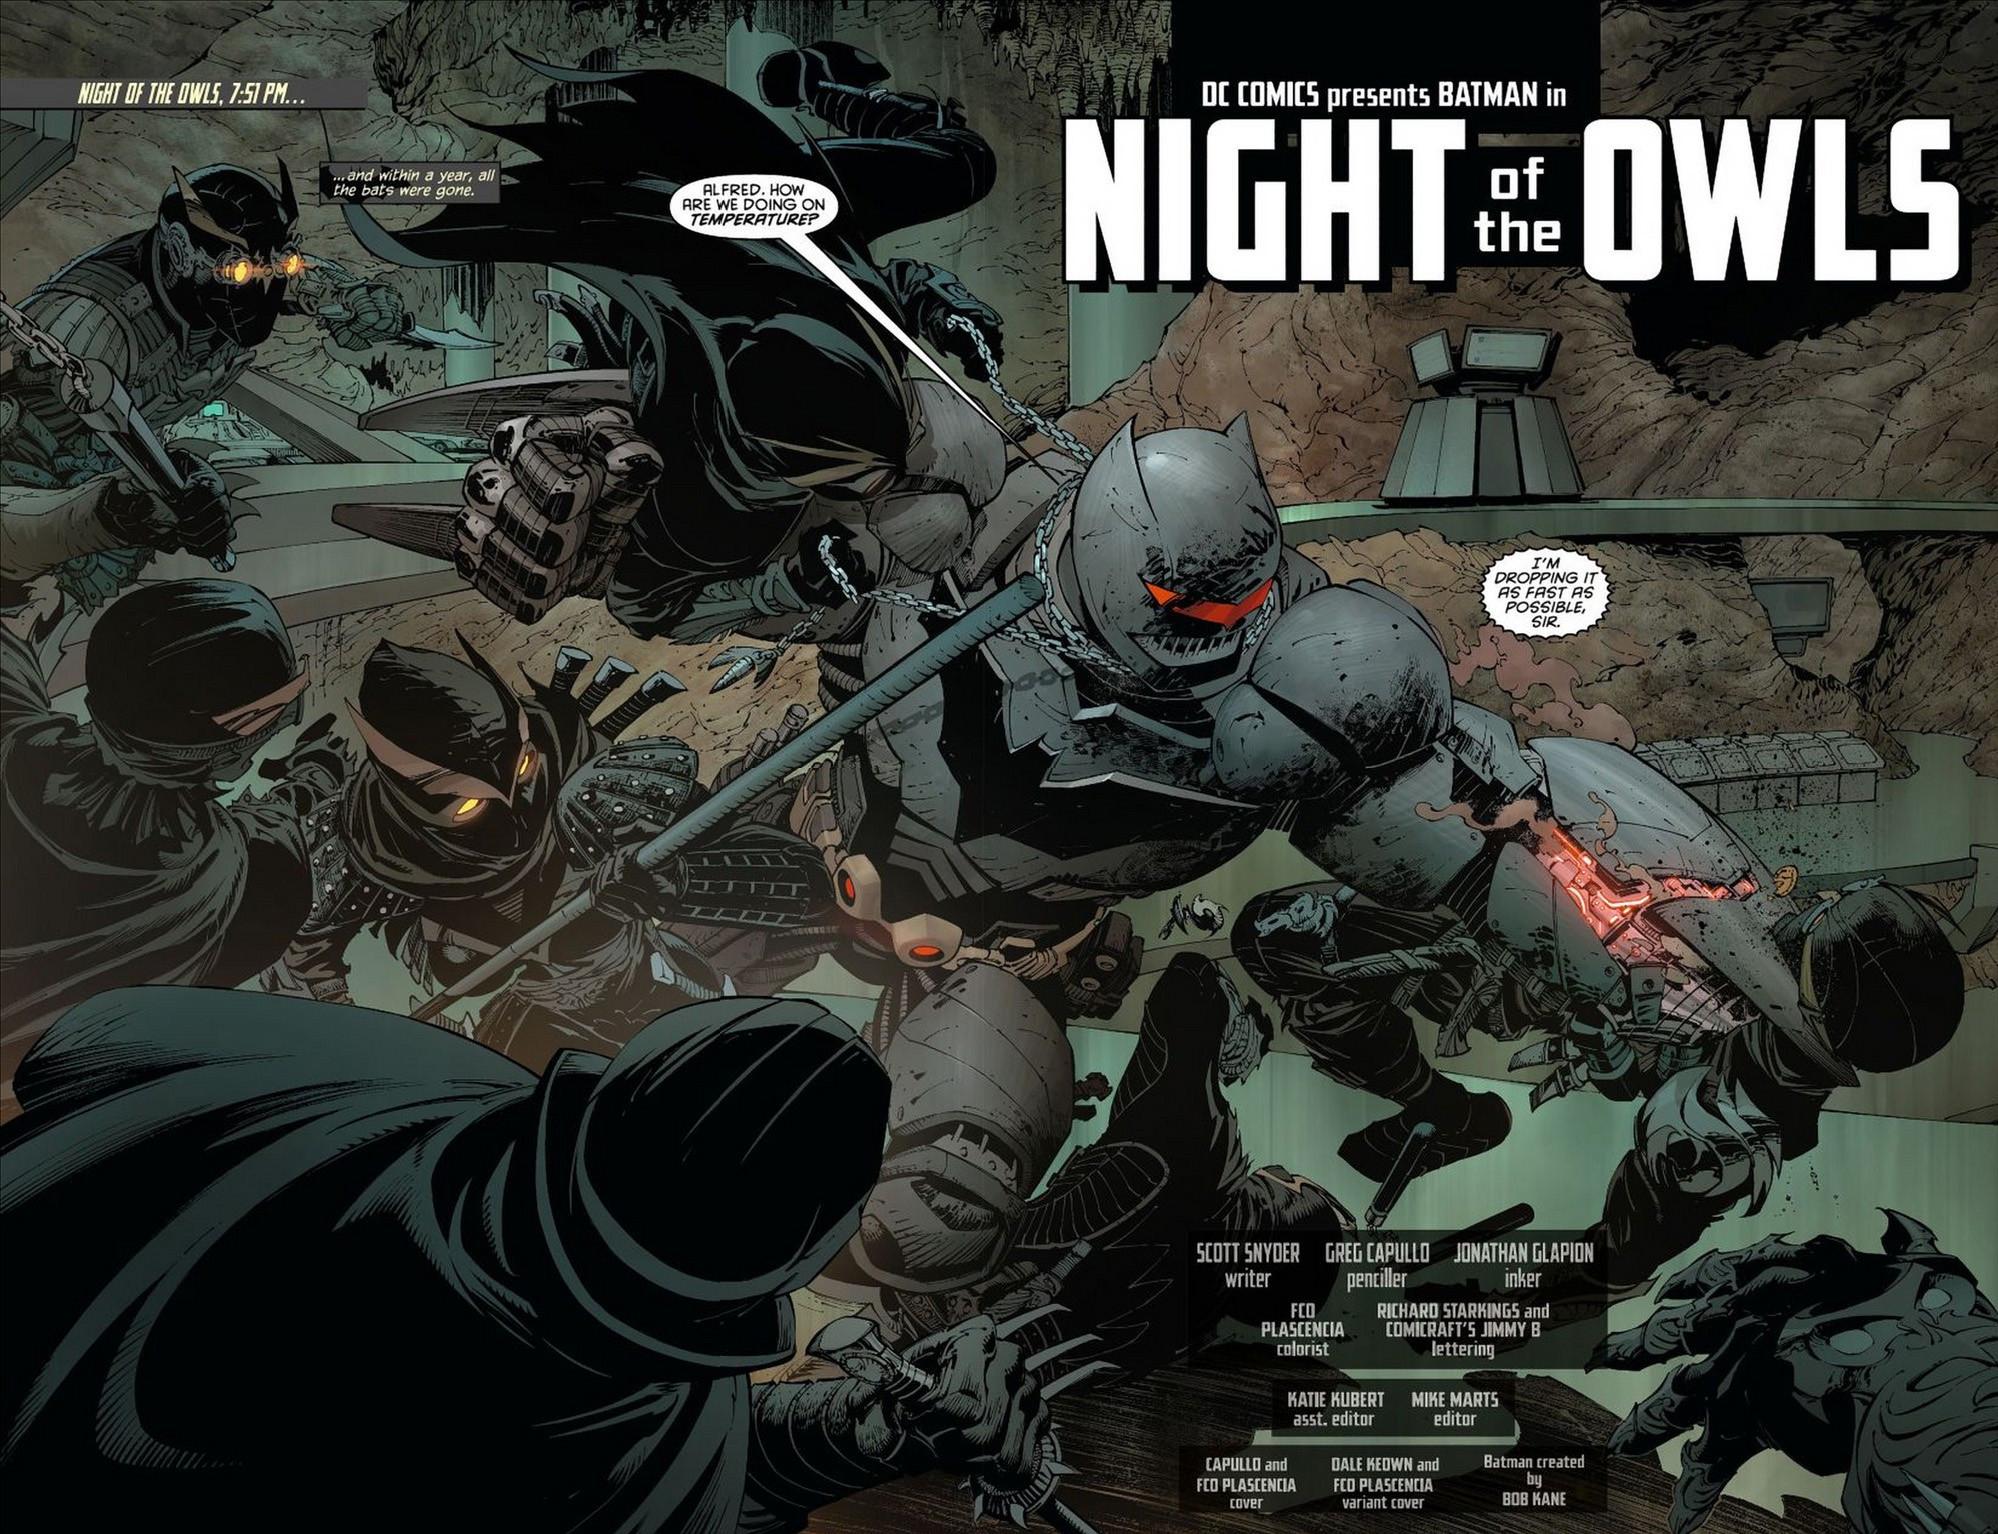 batman's court of owl armor vs talons …